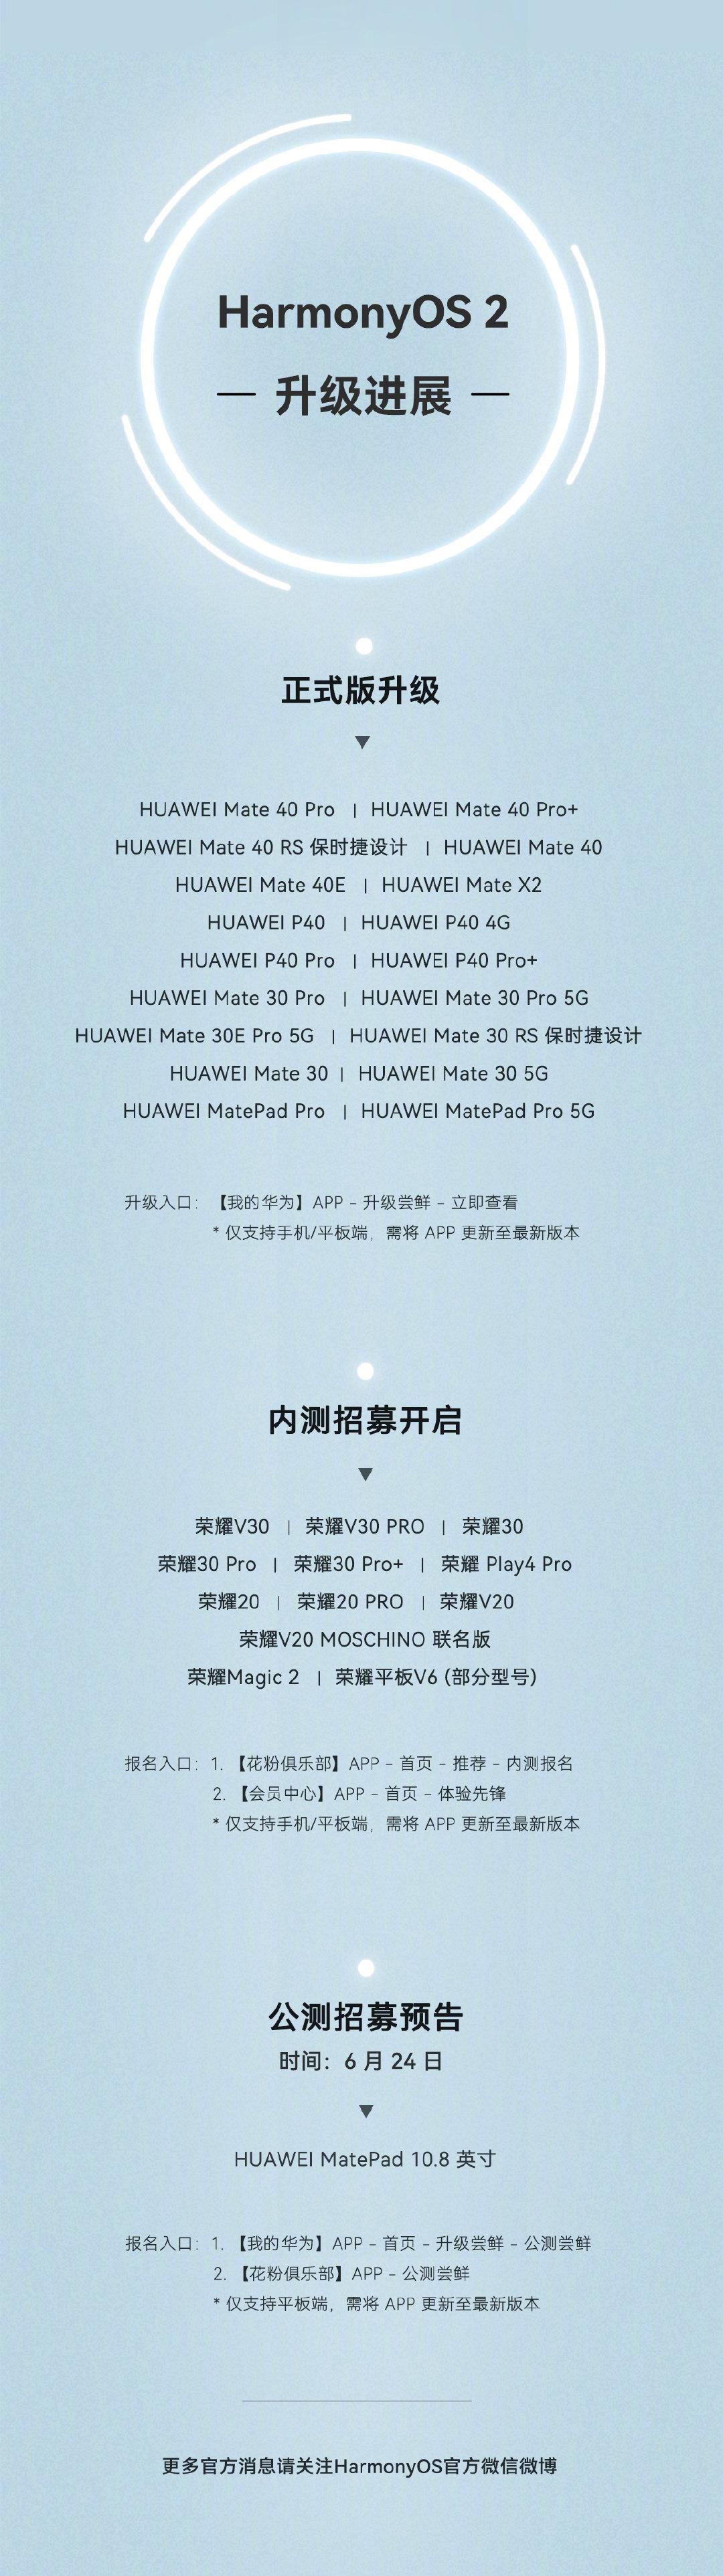 HarmonyOS 2首批正式版升级:18款机型支持